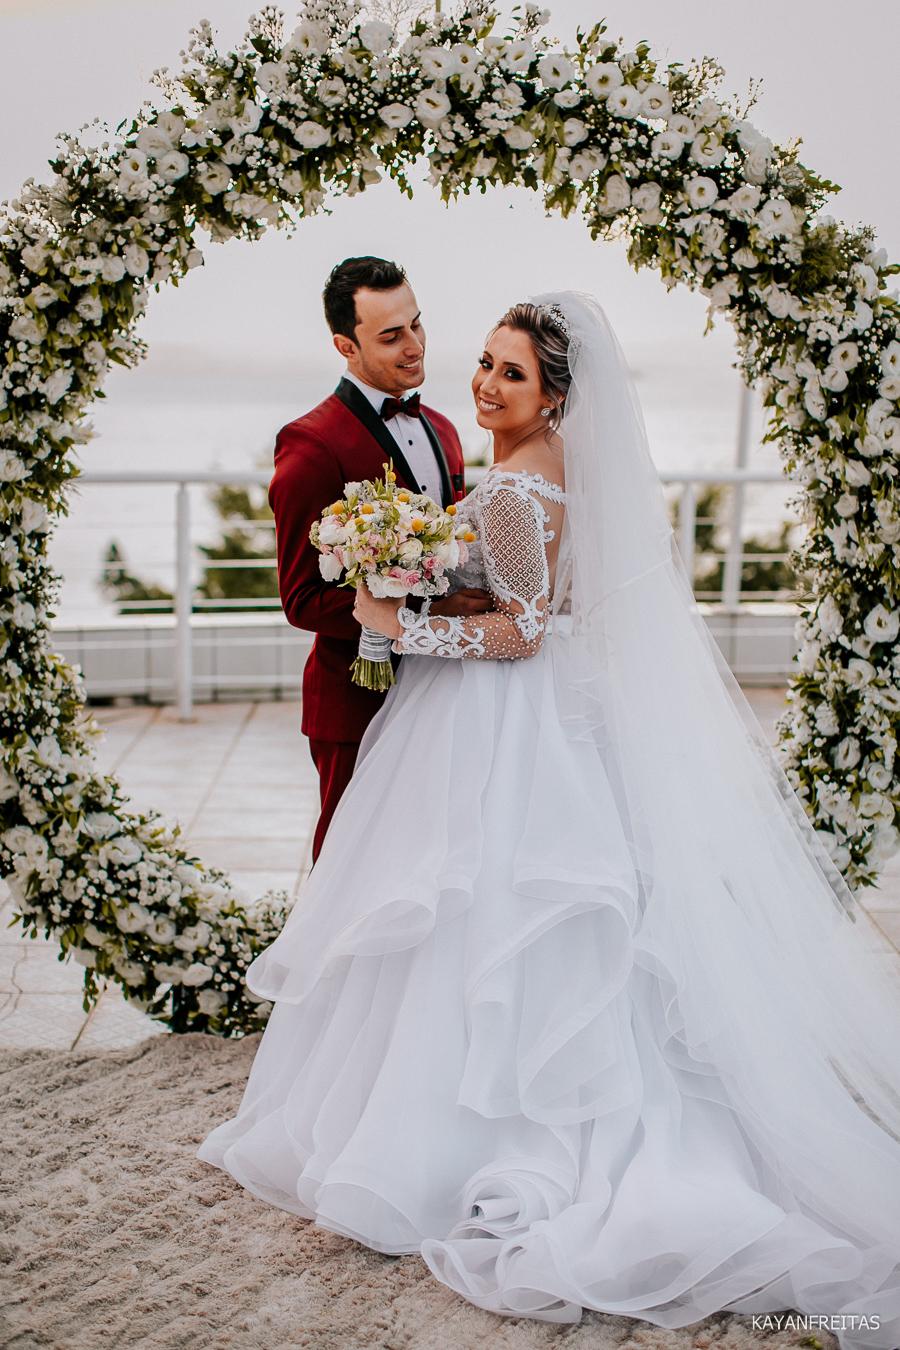 casamento-mariadomar-floripa-0114 Casamento Jéssica e Felipe - Maria do Mar Hotel